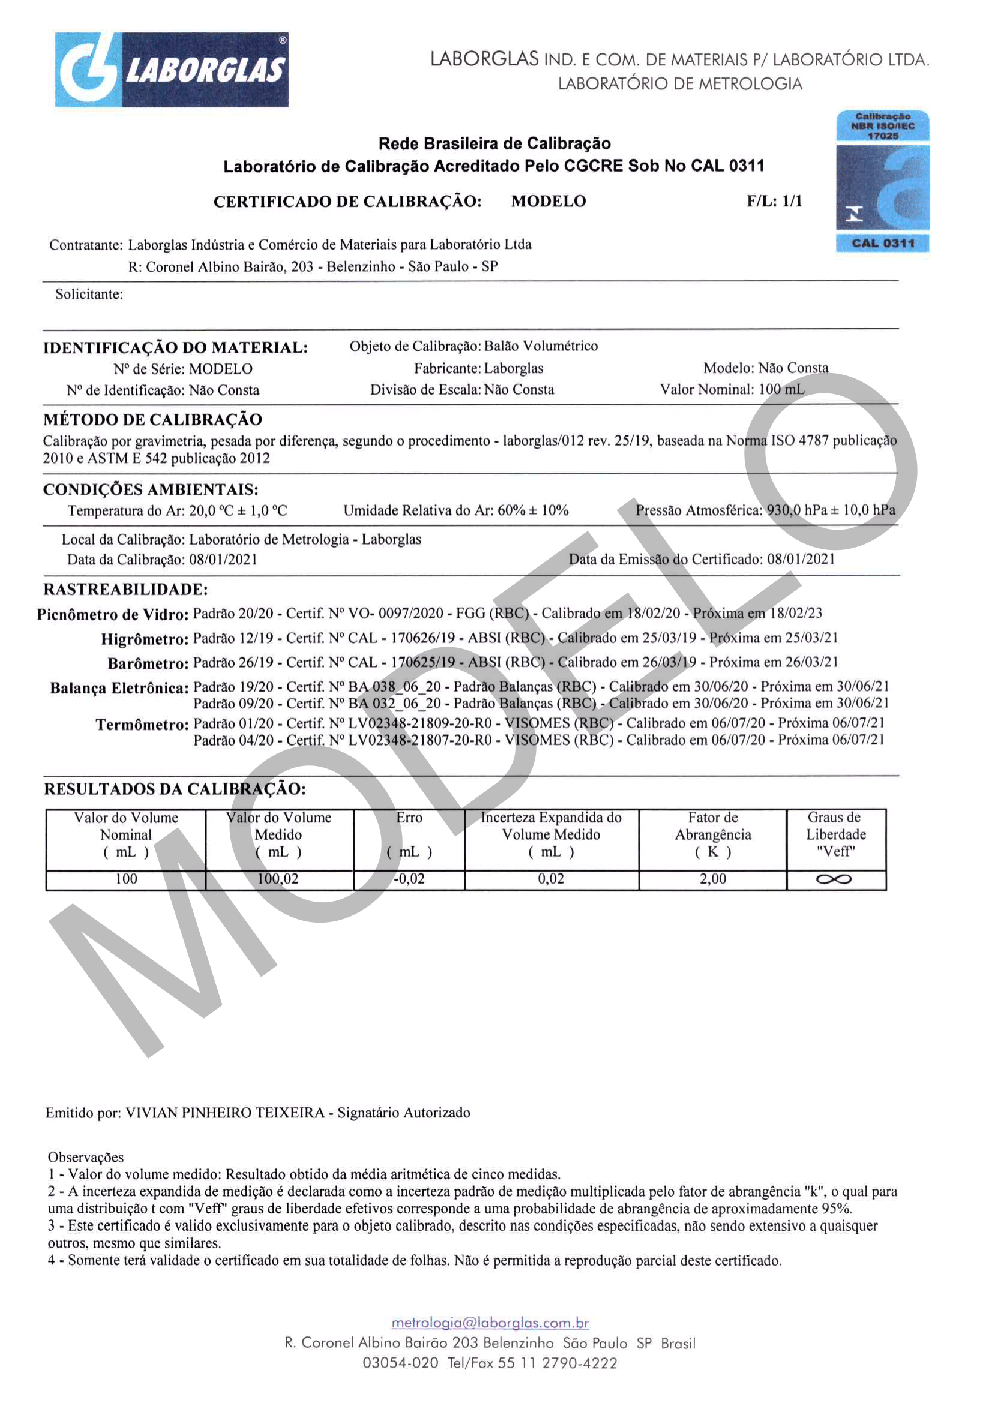 BALÃO VOLUMÉTRICO CLASSE A ROLHA POLI C/ CERTIFICADO RBC 10 ML - Marca Laborglas - Cód. 9167808-R